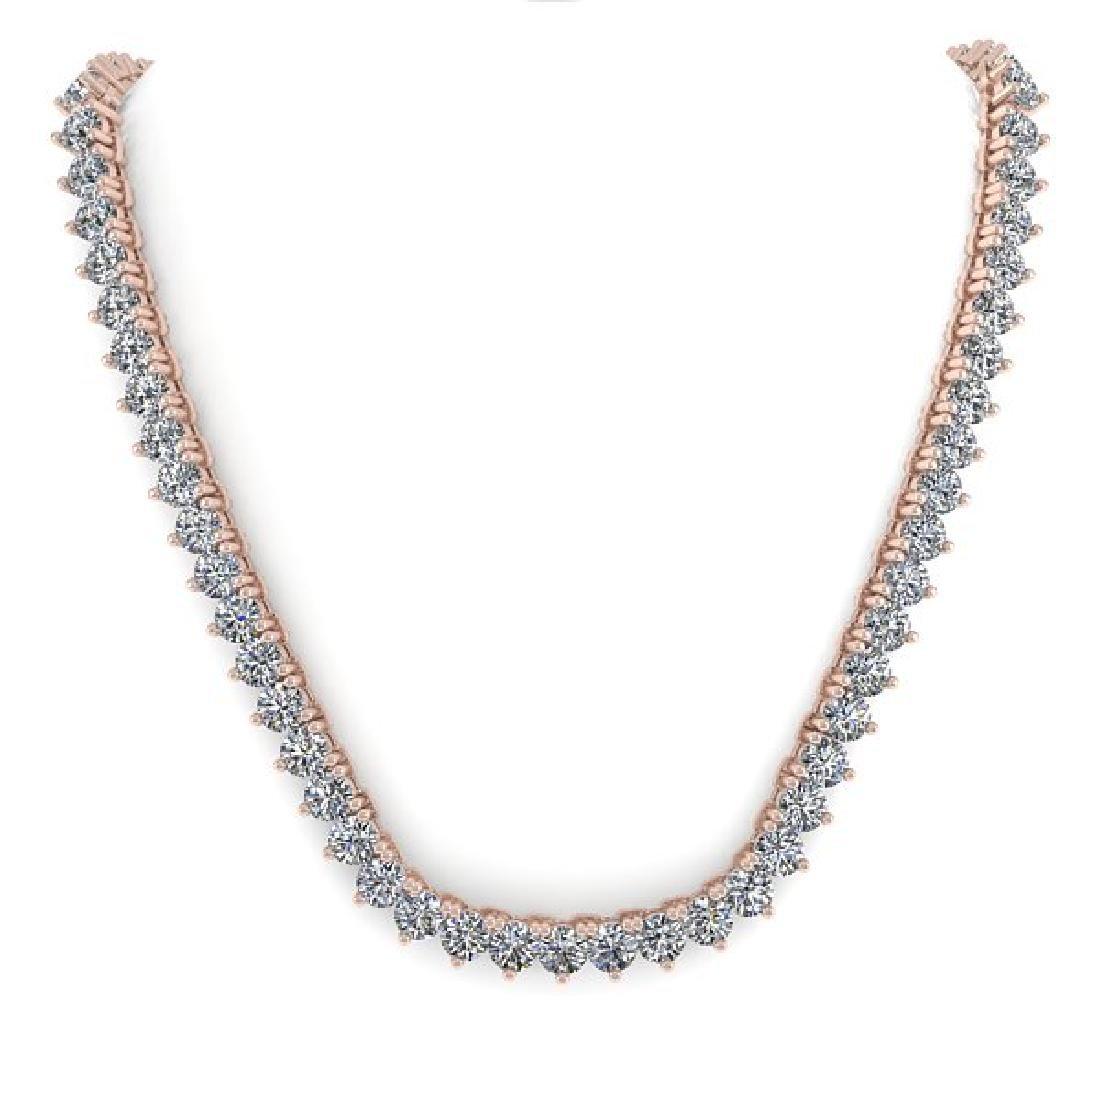 15 CTW Solitaire VS/SI Diamond Necklace 14K Rose Gold - 3